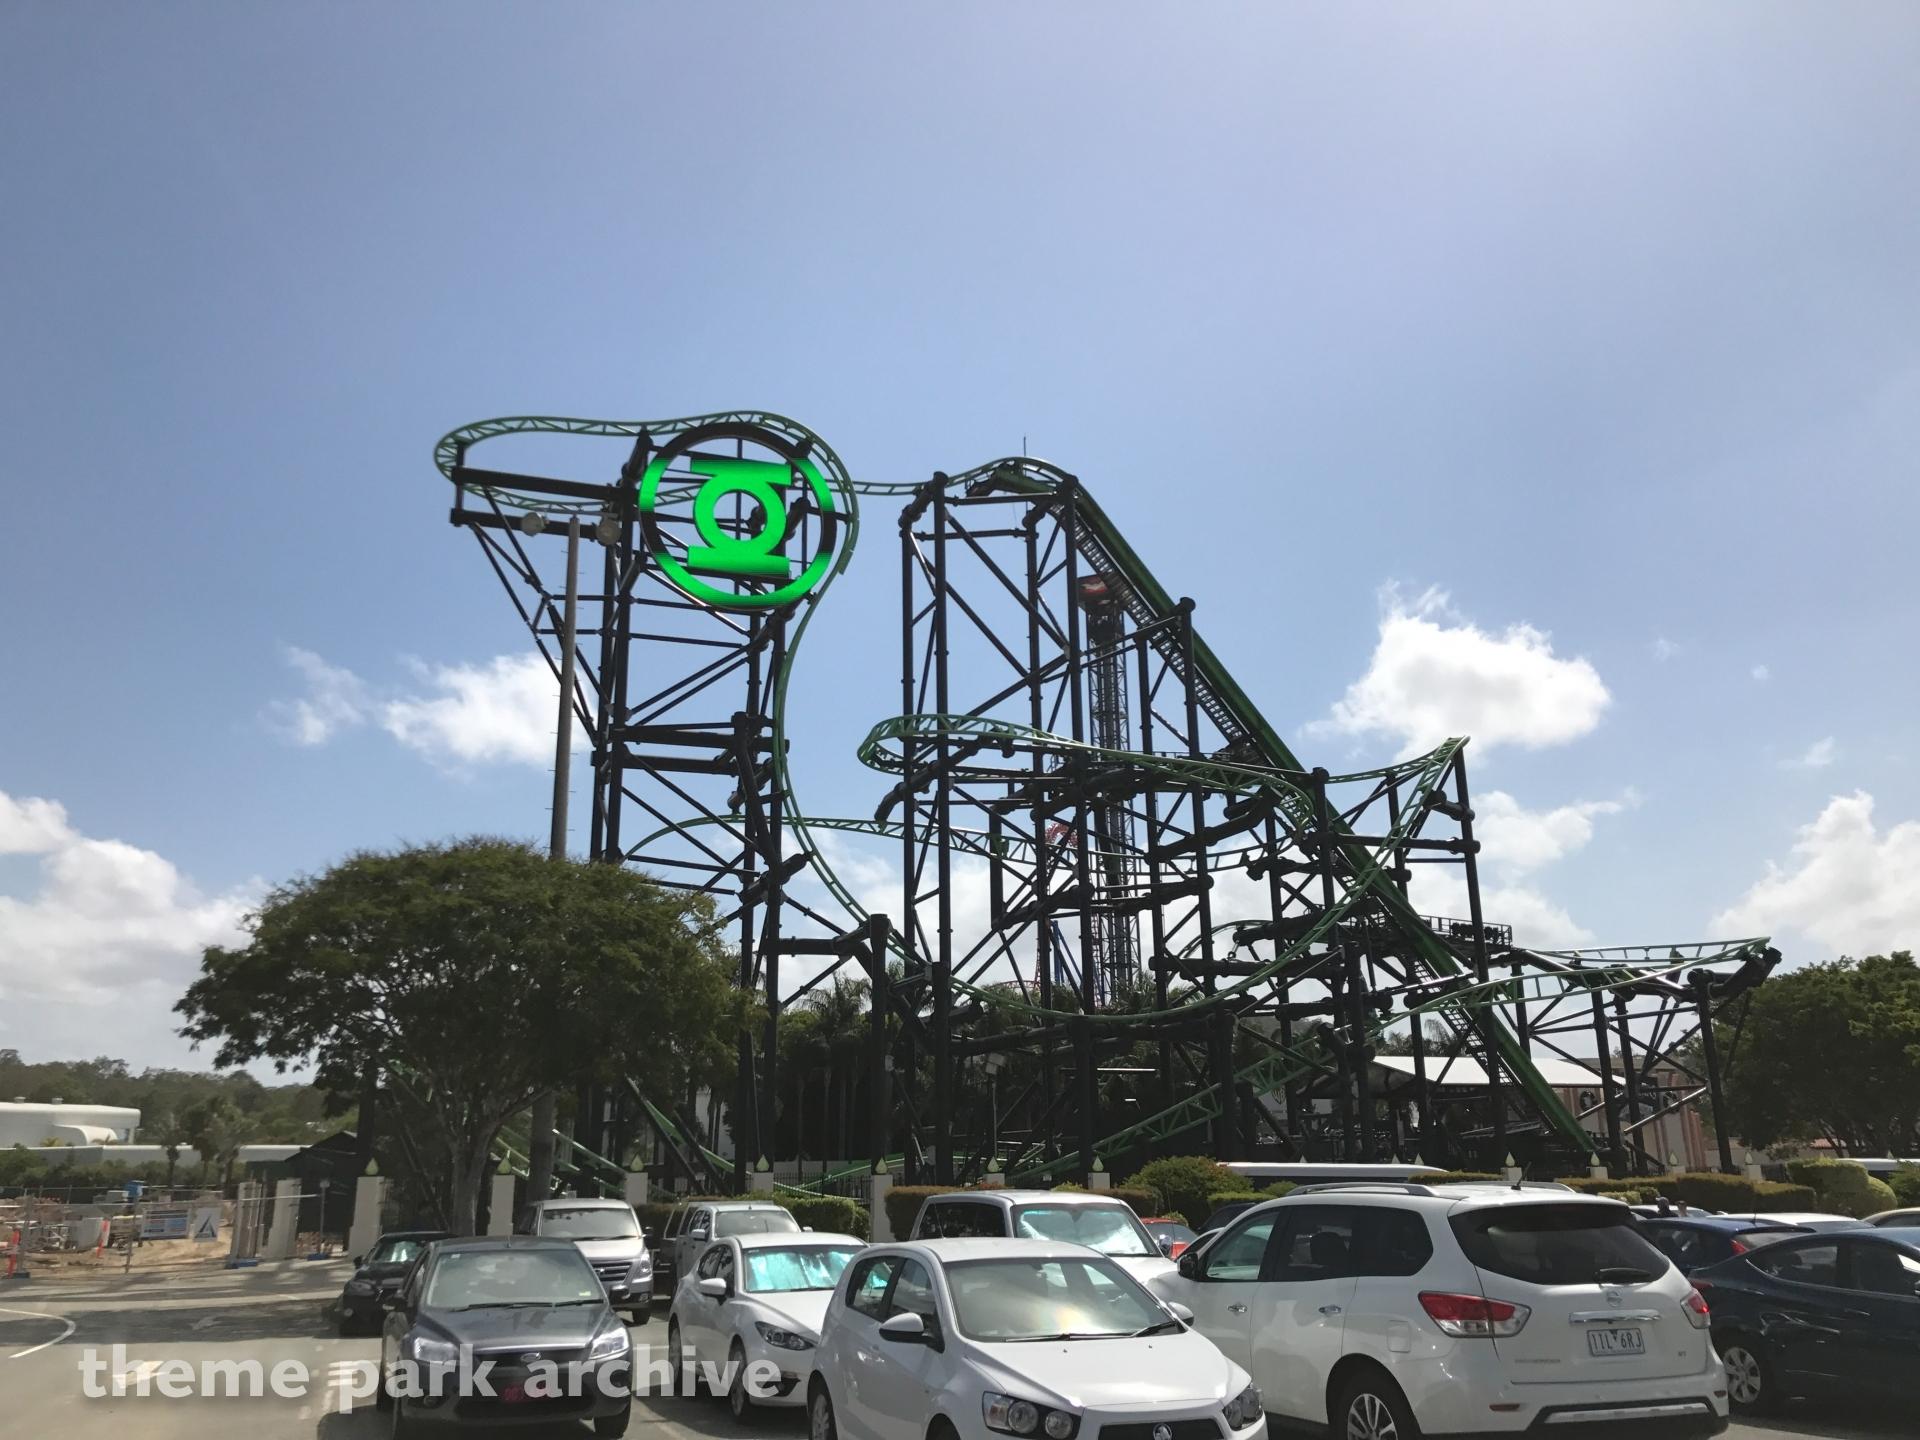 Green Lantern Coaster At Warner Bros Movie World Theme Park Archive